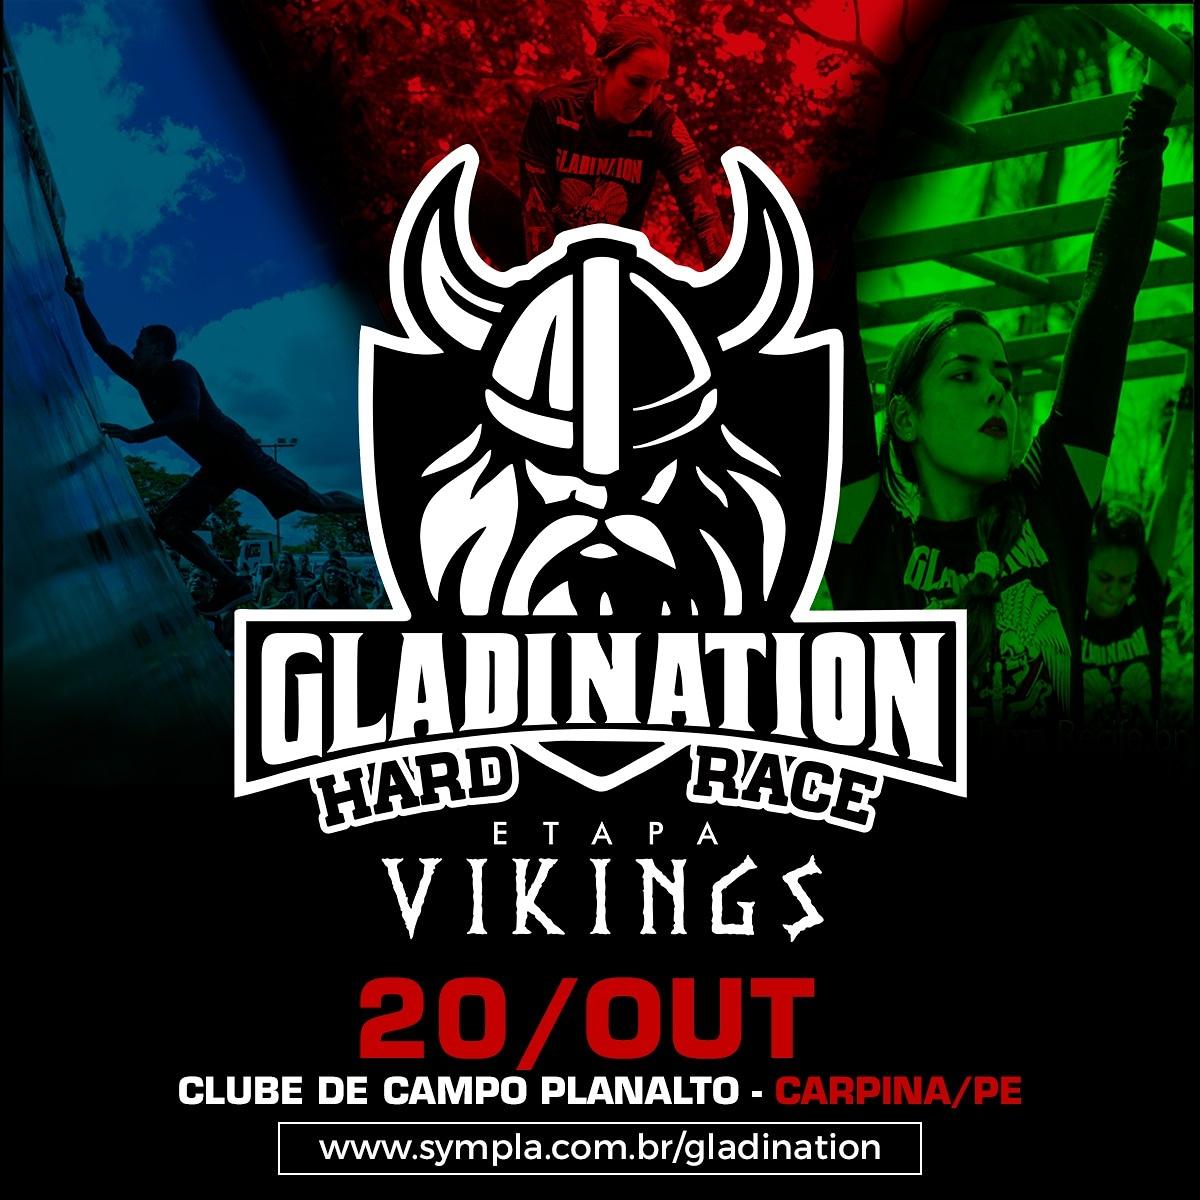 Gladination